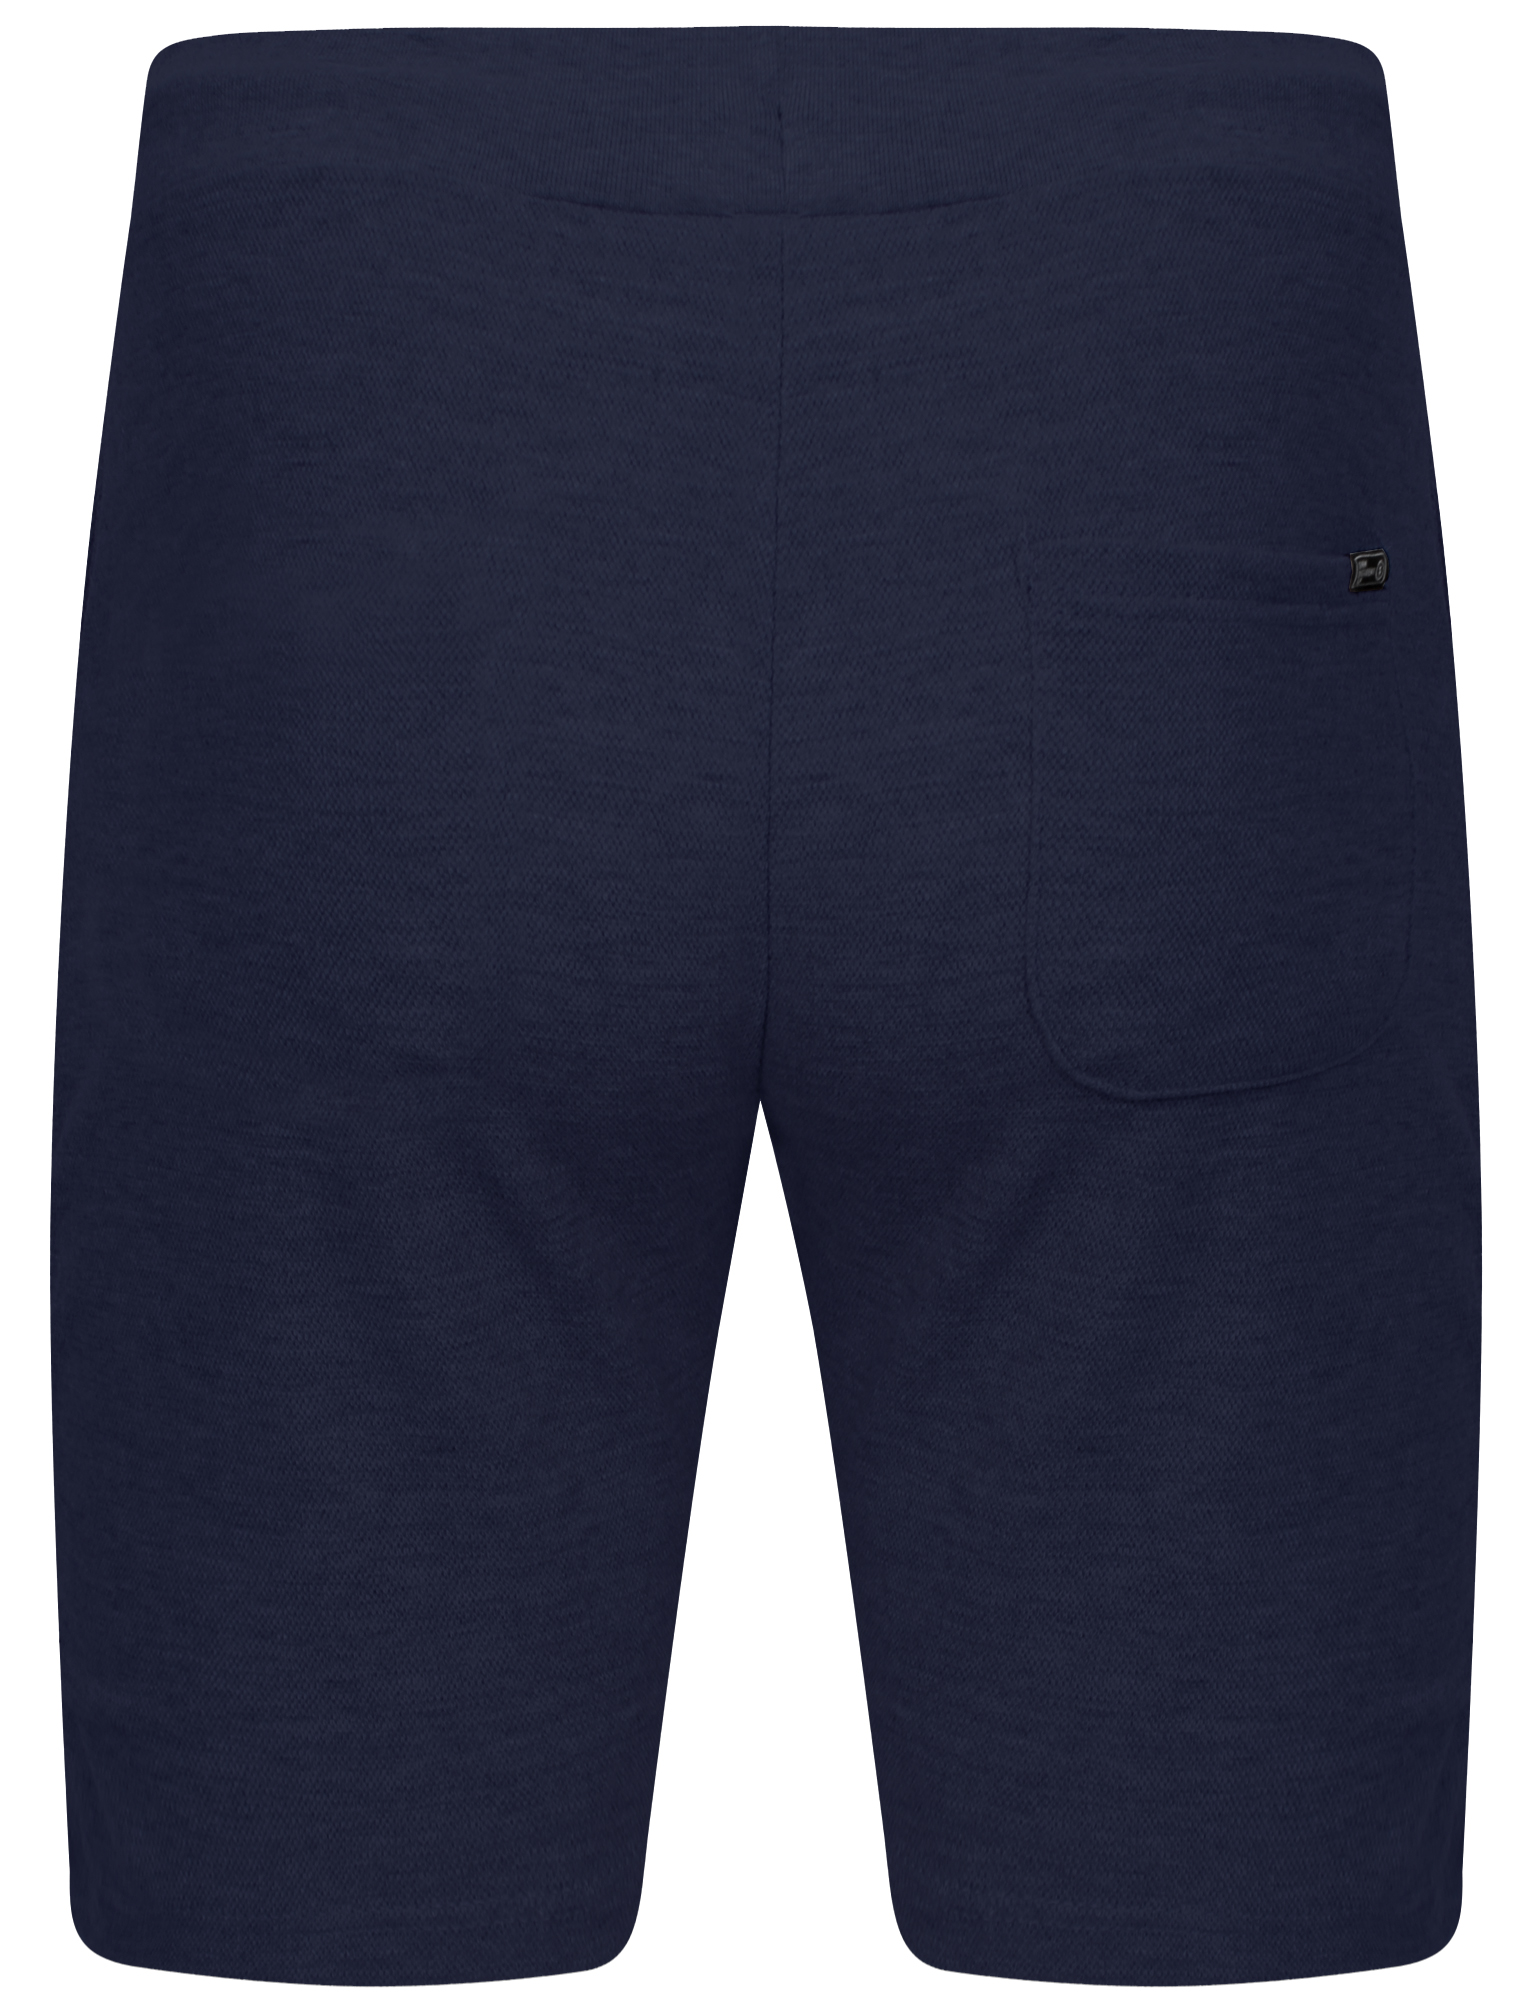 New Mens Dissident Chesemen Textured Drawstring Sweat Jogging Shorts Size S-XXL